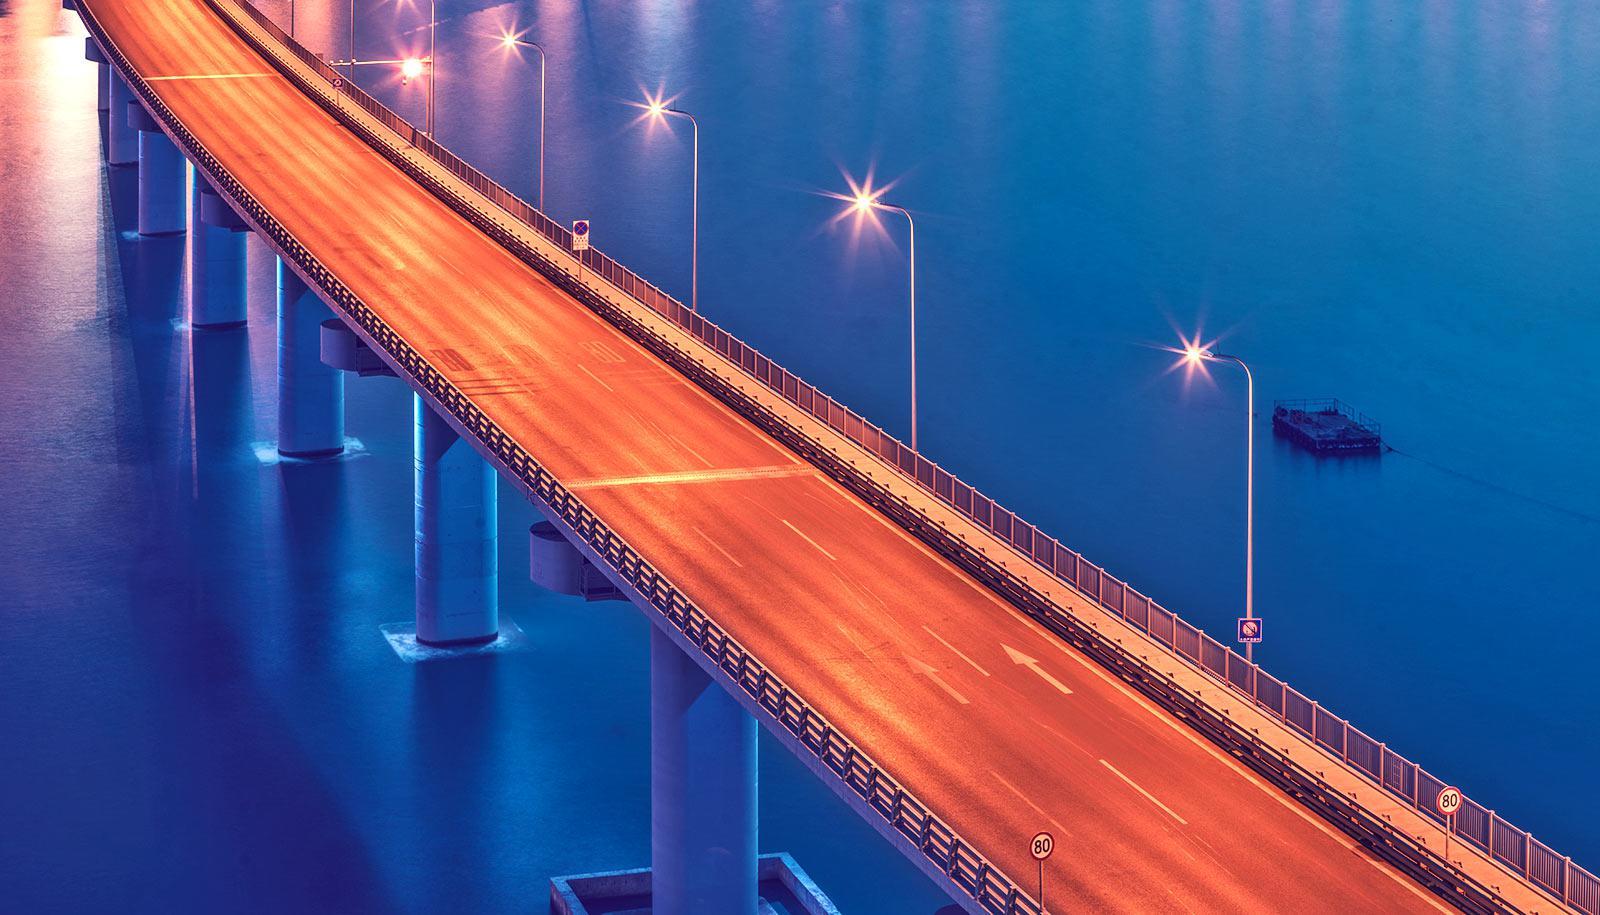 bridge under orange light